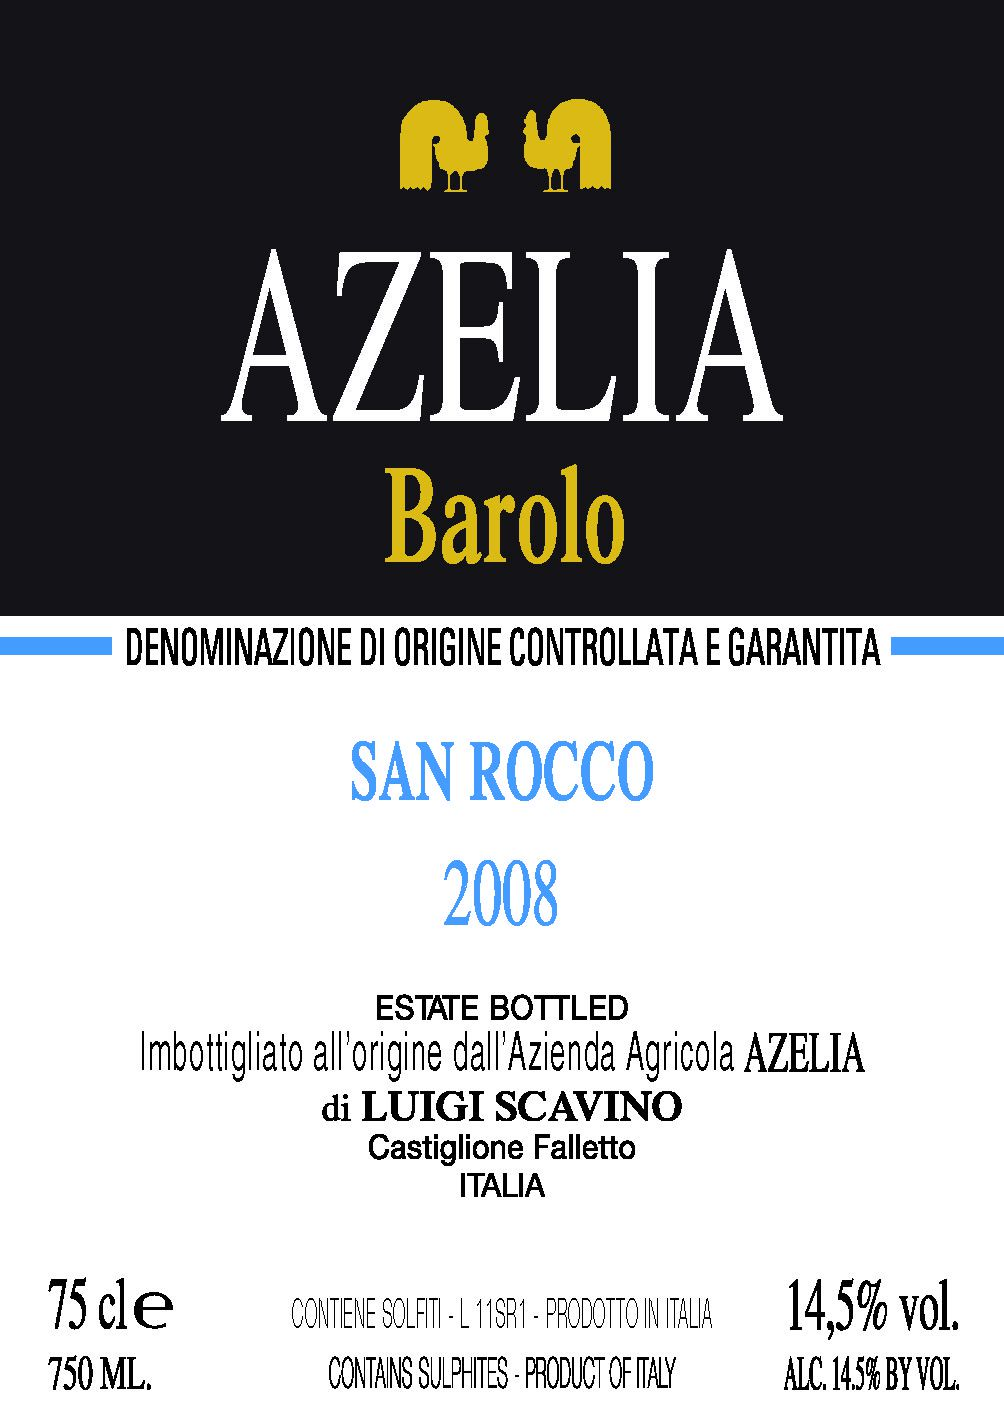 Azelia Barolo San Rocco 2008 (Piedmont)